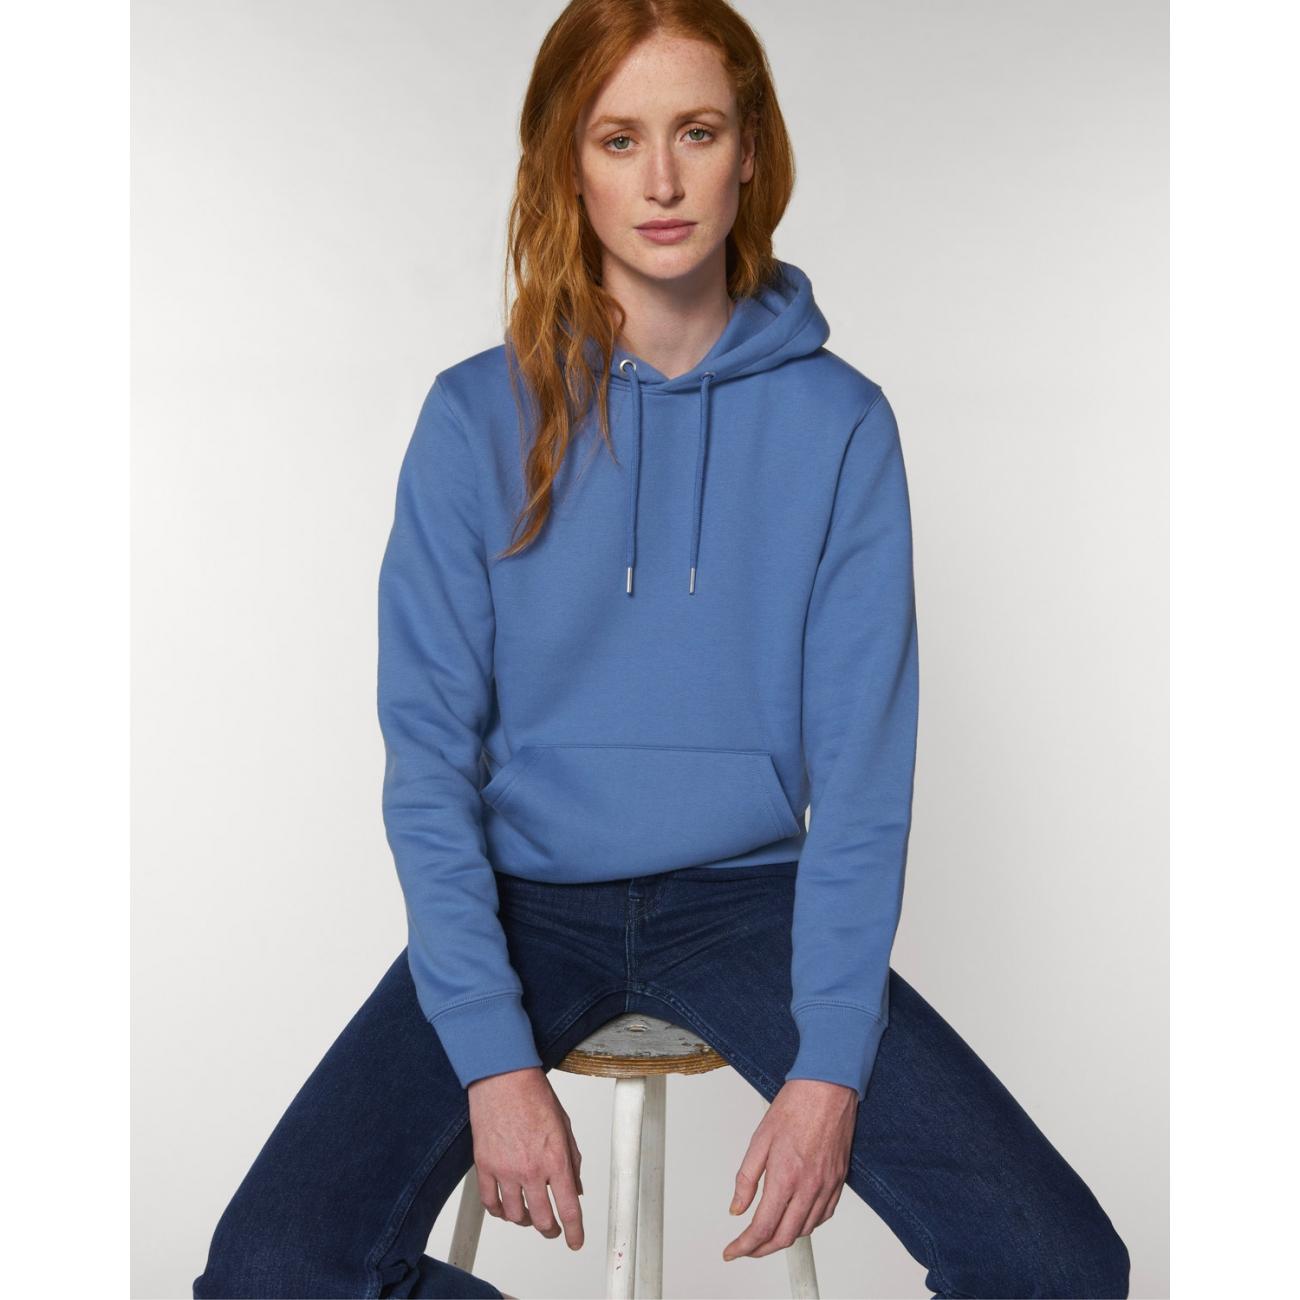 https://tee-shirt-bio.com/9881-thickbox_default/sweat-shirt-femme-capuche-epais-et-interieur-doux-coton-bio-beau-bleu-lumineux.jpg